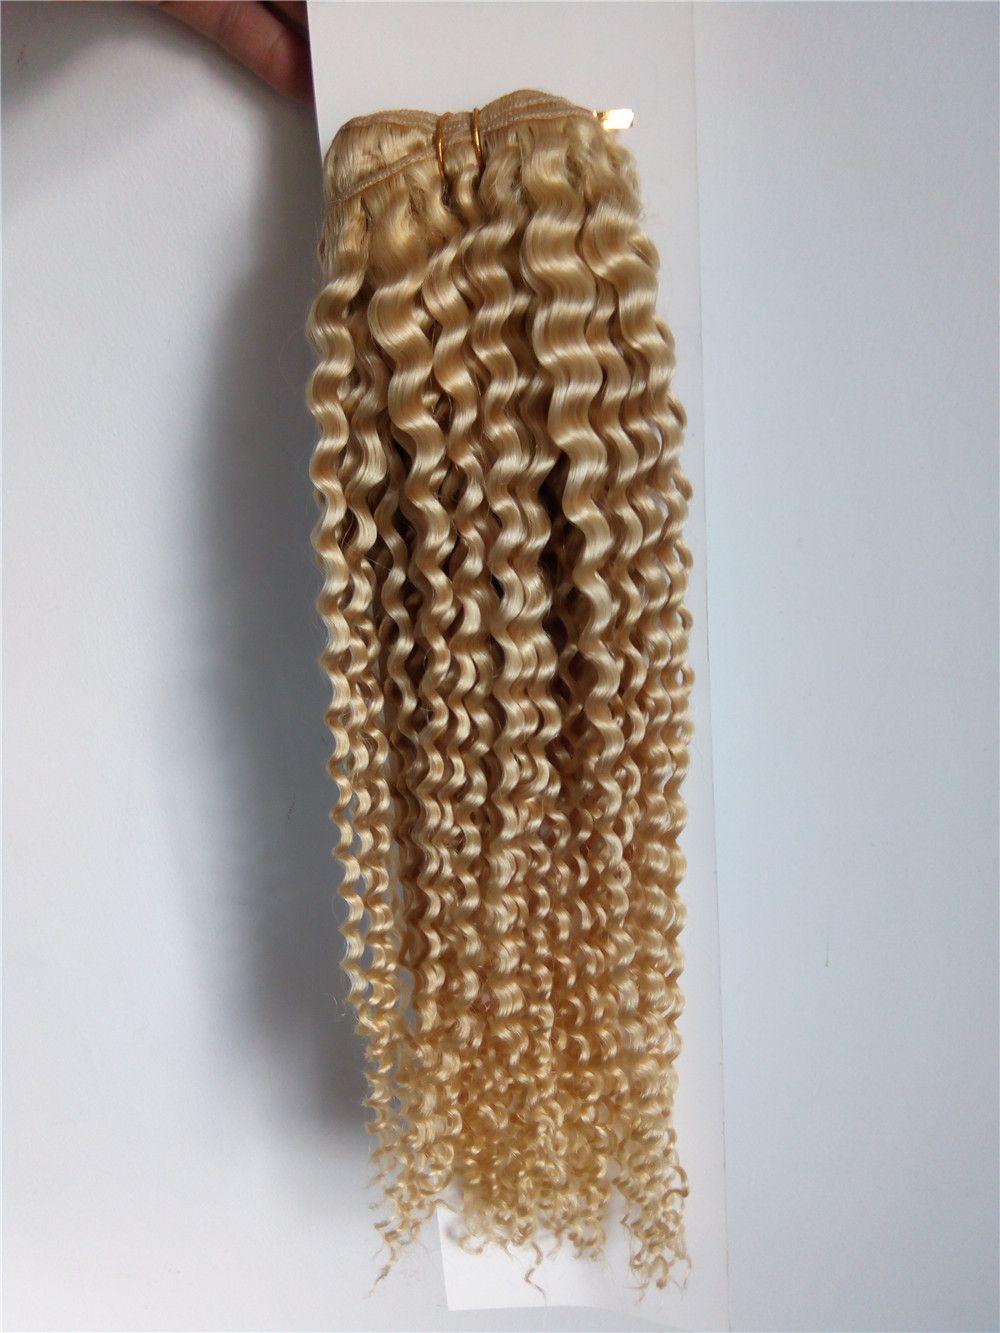 Blonde Human Hair Weaves 12-28Inch #613 Brazilian Peruvian Deep Wave Curly Hair Extensions 7A Grade High Quality Hair Weft